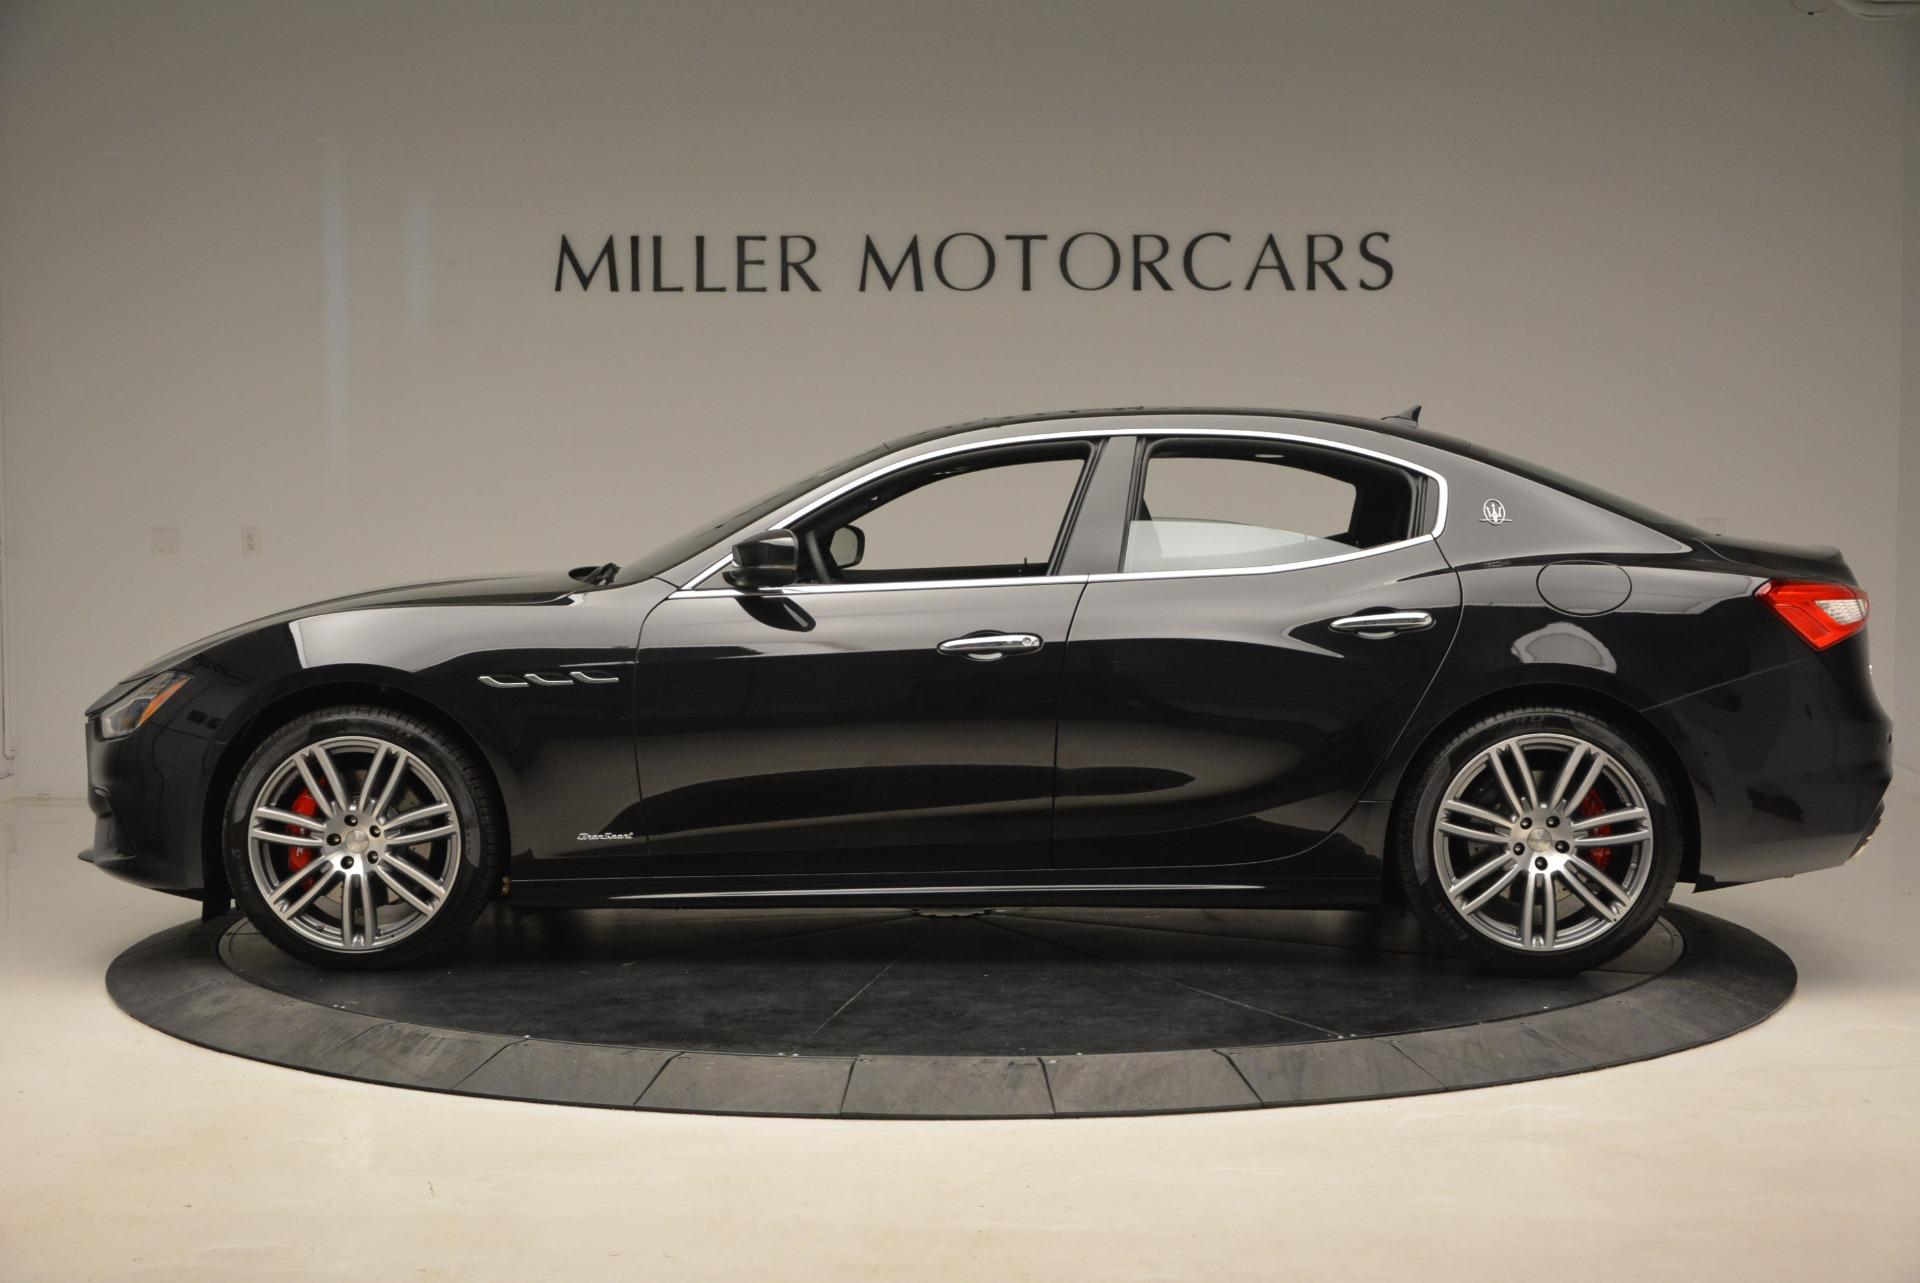 New 2018 Maserati Ghibli S Q4 Gransport For Sale In Greenwich, CT 2036_p3